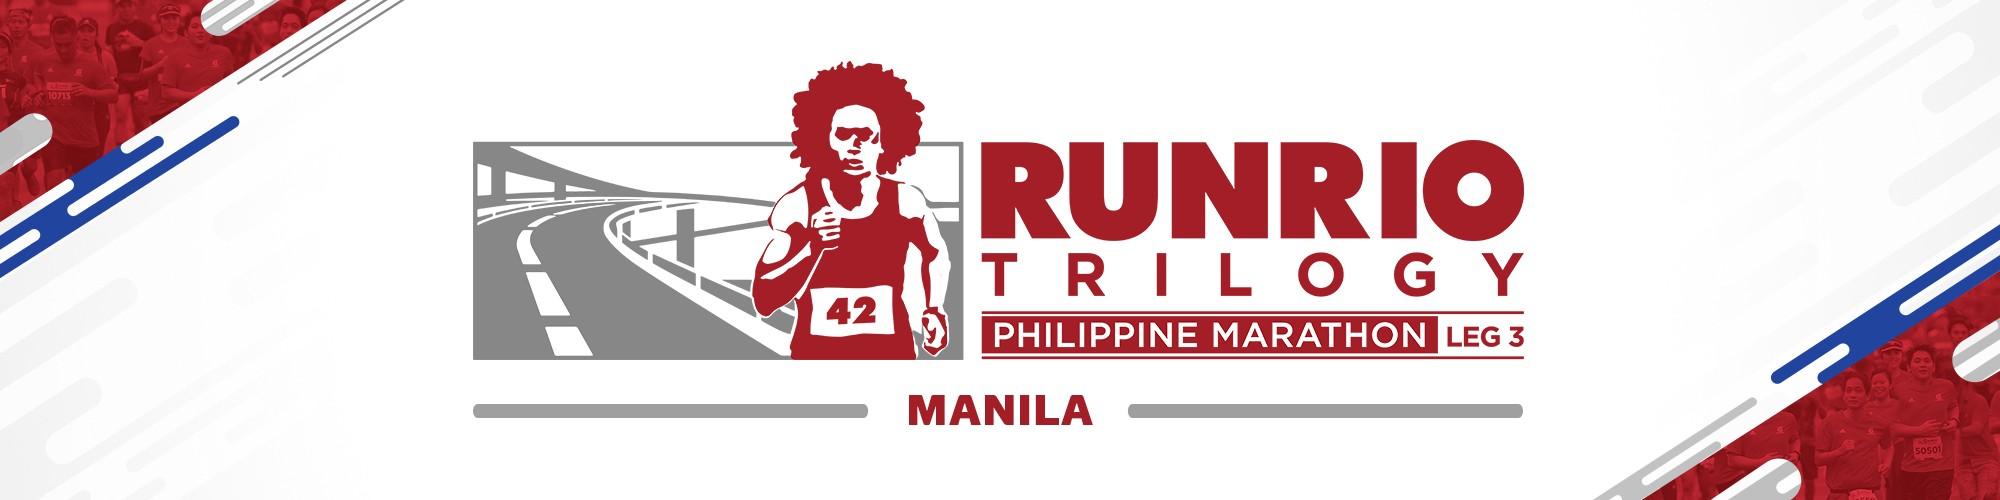 RUNRIO Trilogy Manila Leg 3